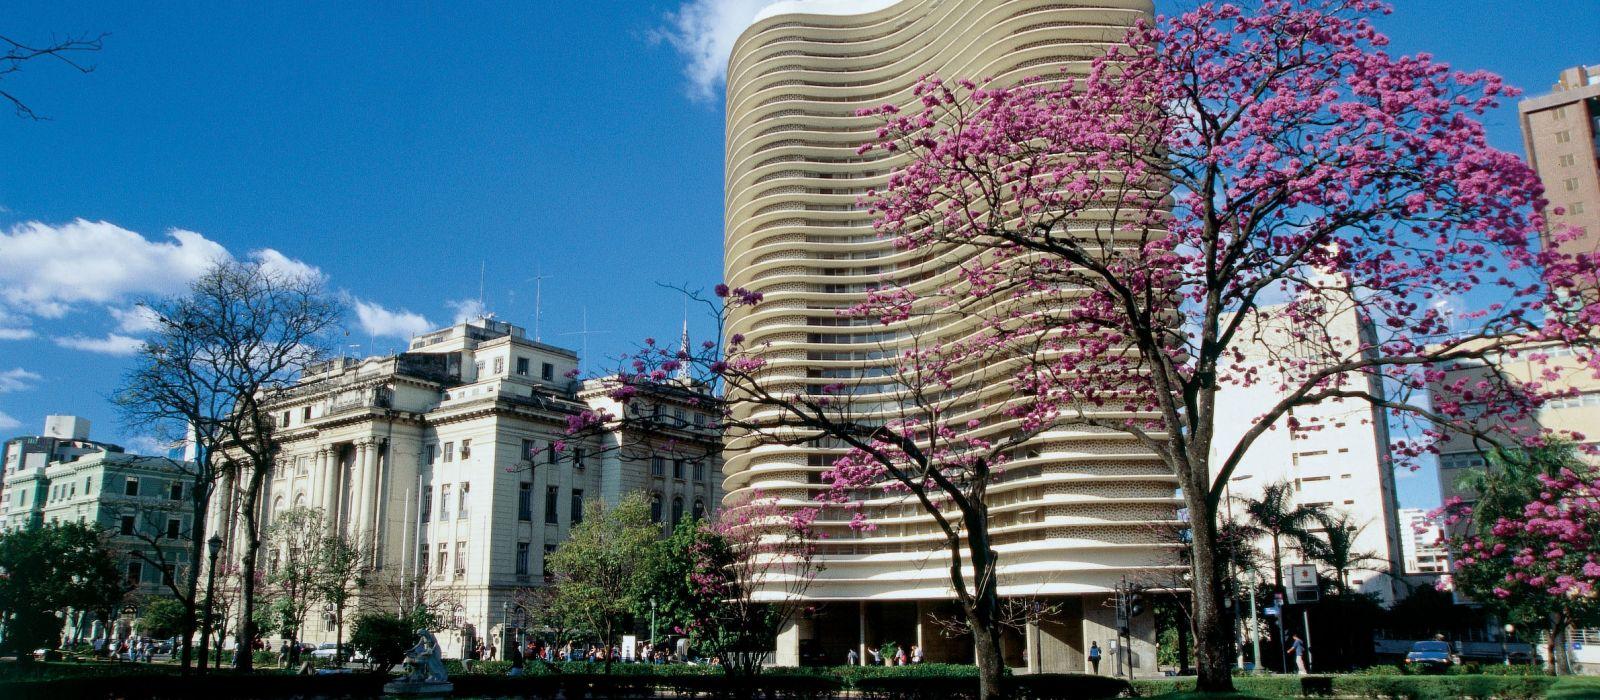 Hotel Bourbon Belo Horizonte Brazil